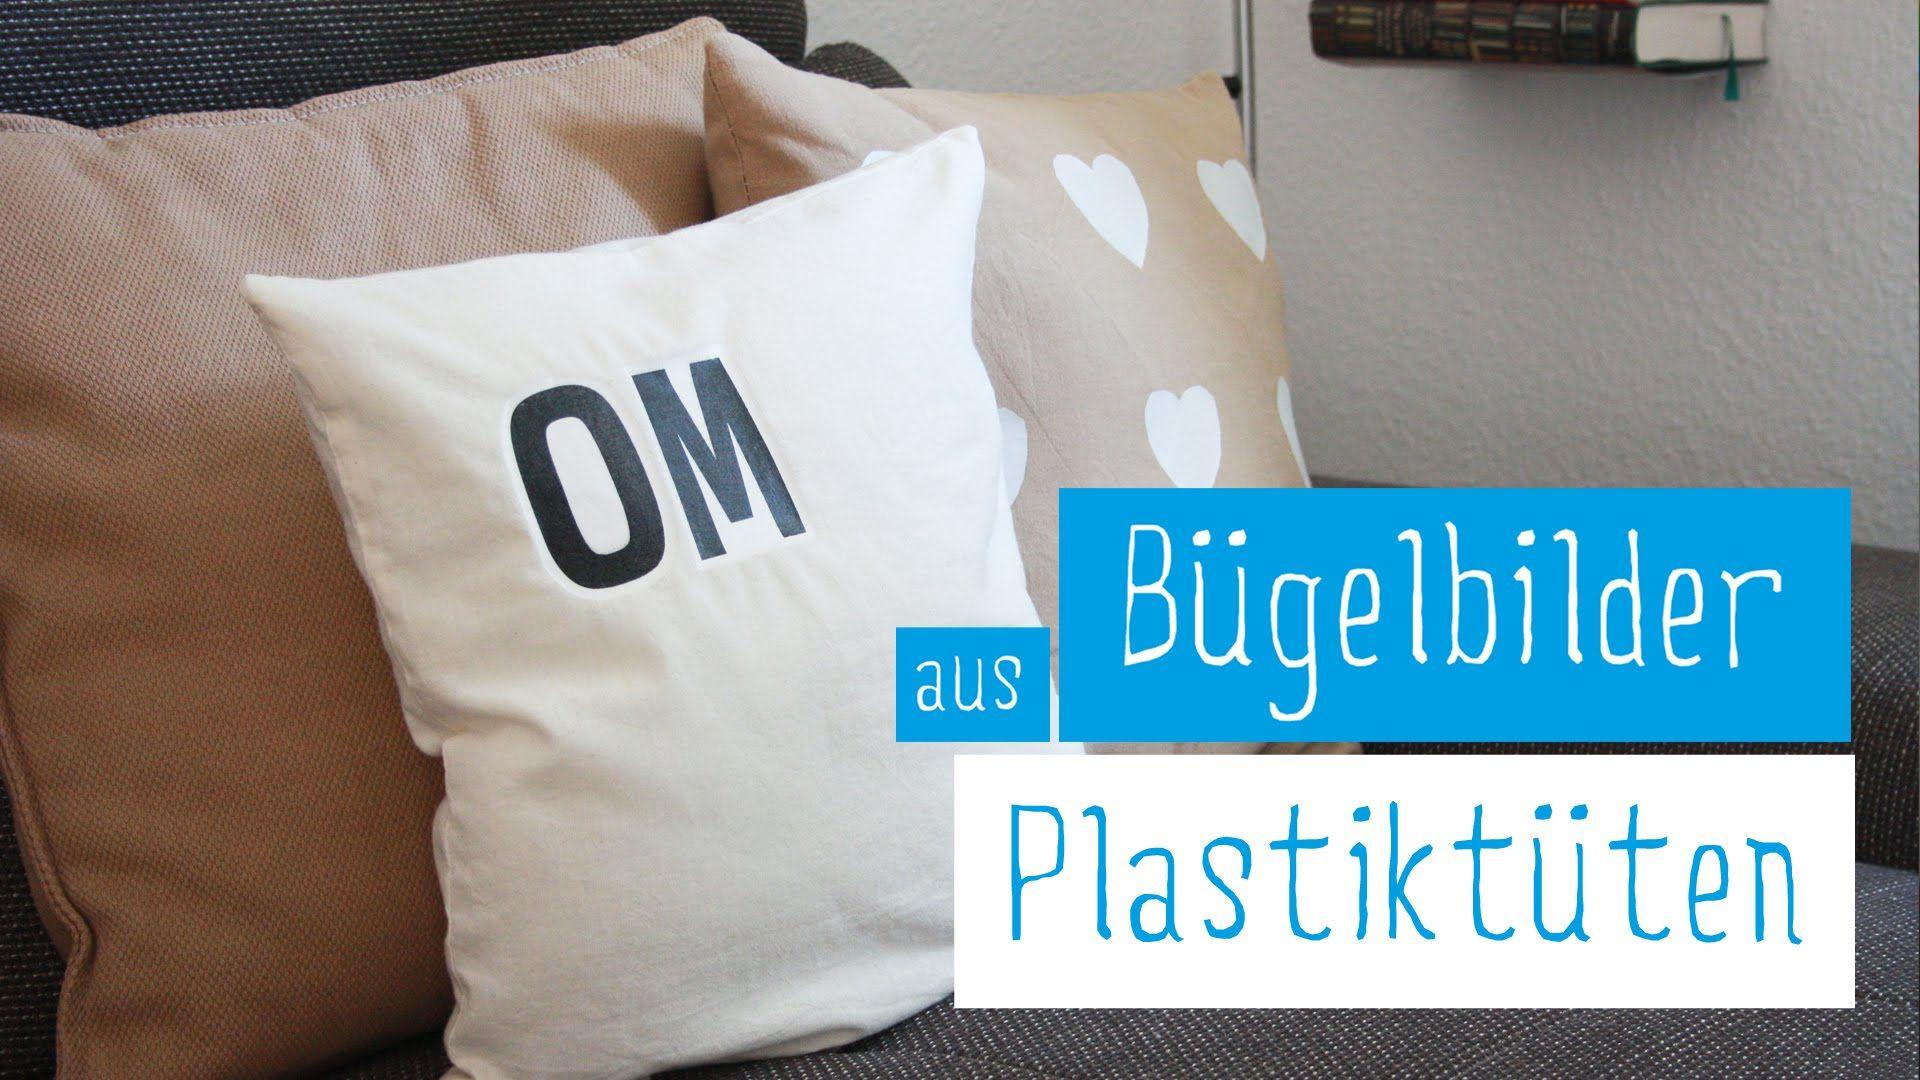 upcycling diy kissen selbst bedrucken plastikt ten aufb geln transferte wichtigbastelei. Black Bedroom Furniture Sets. Home Design Ideas